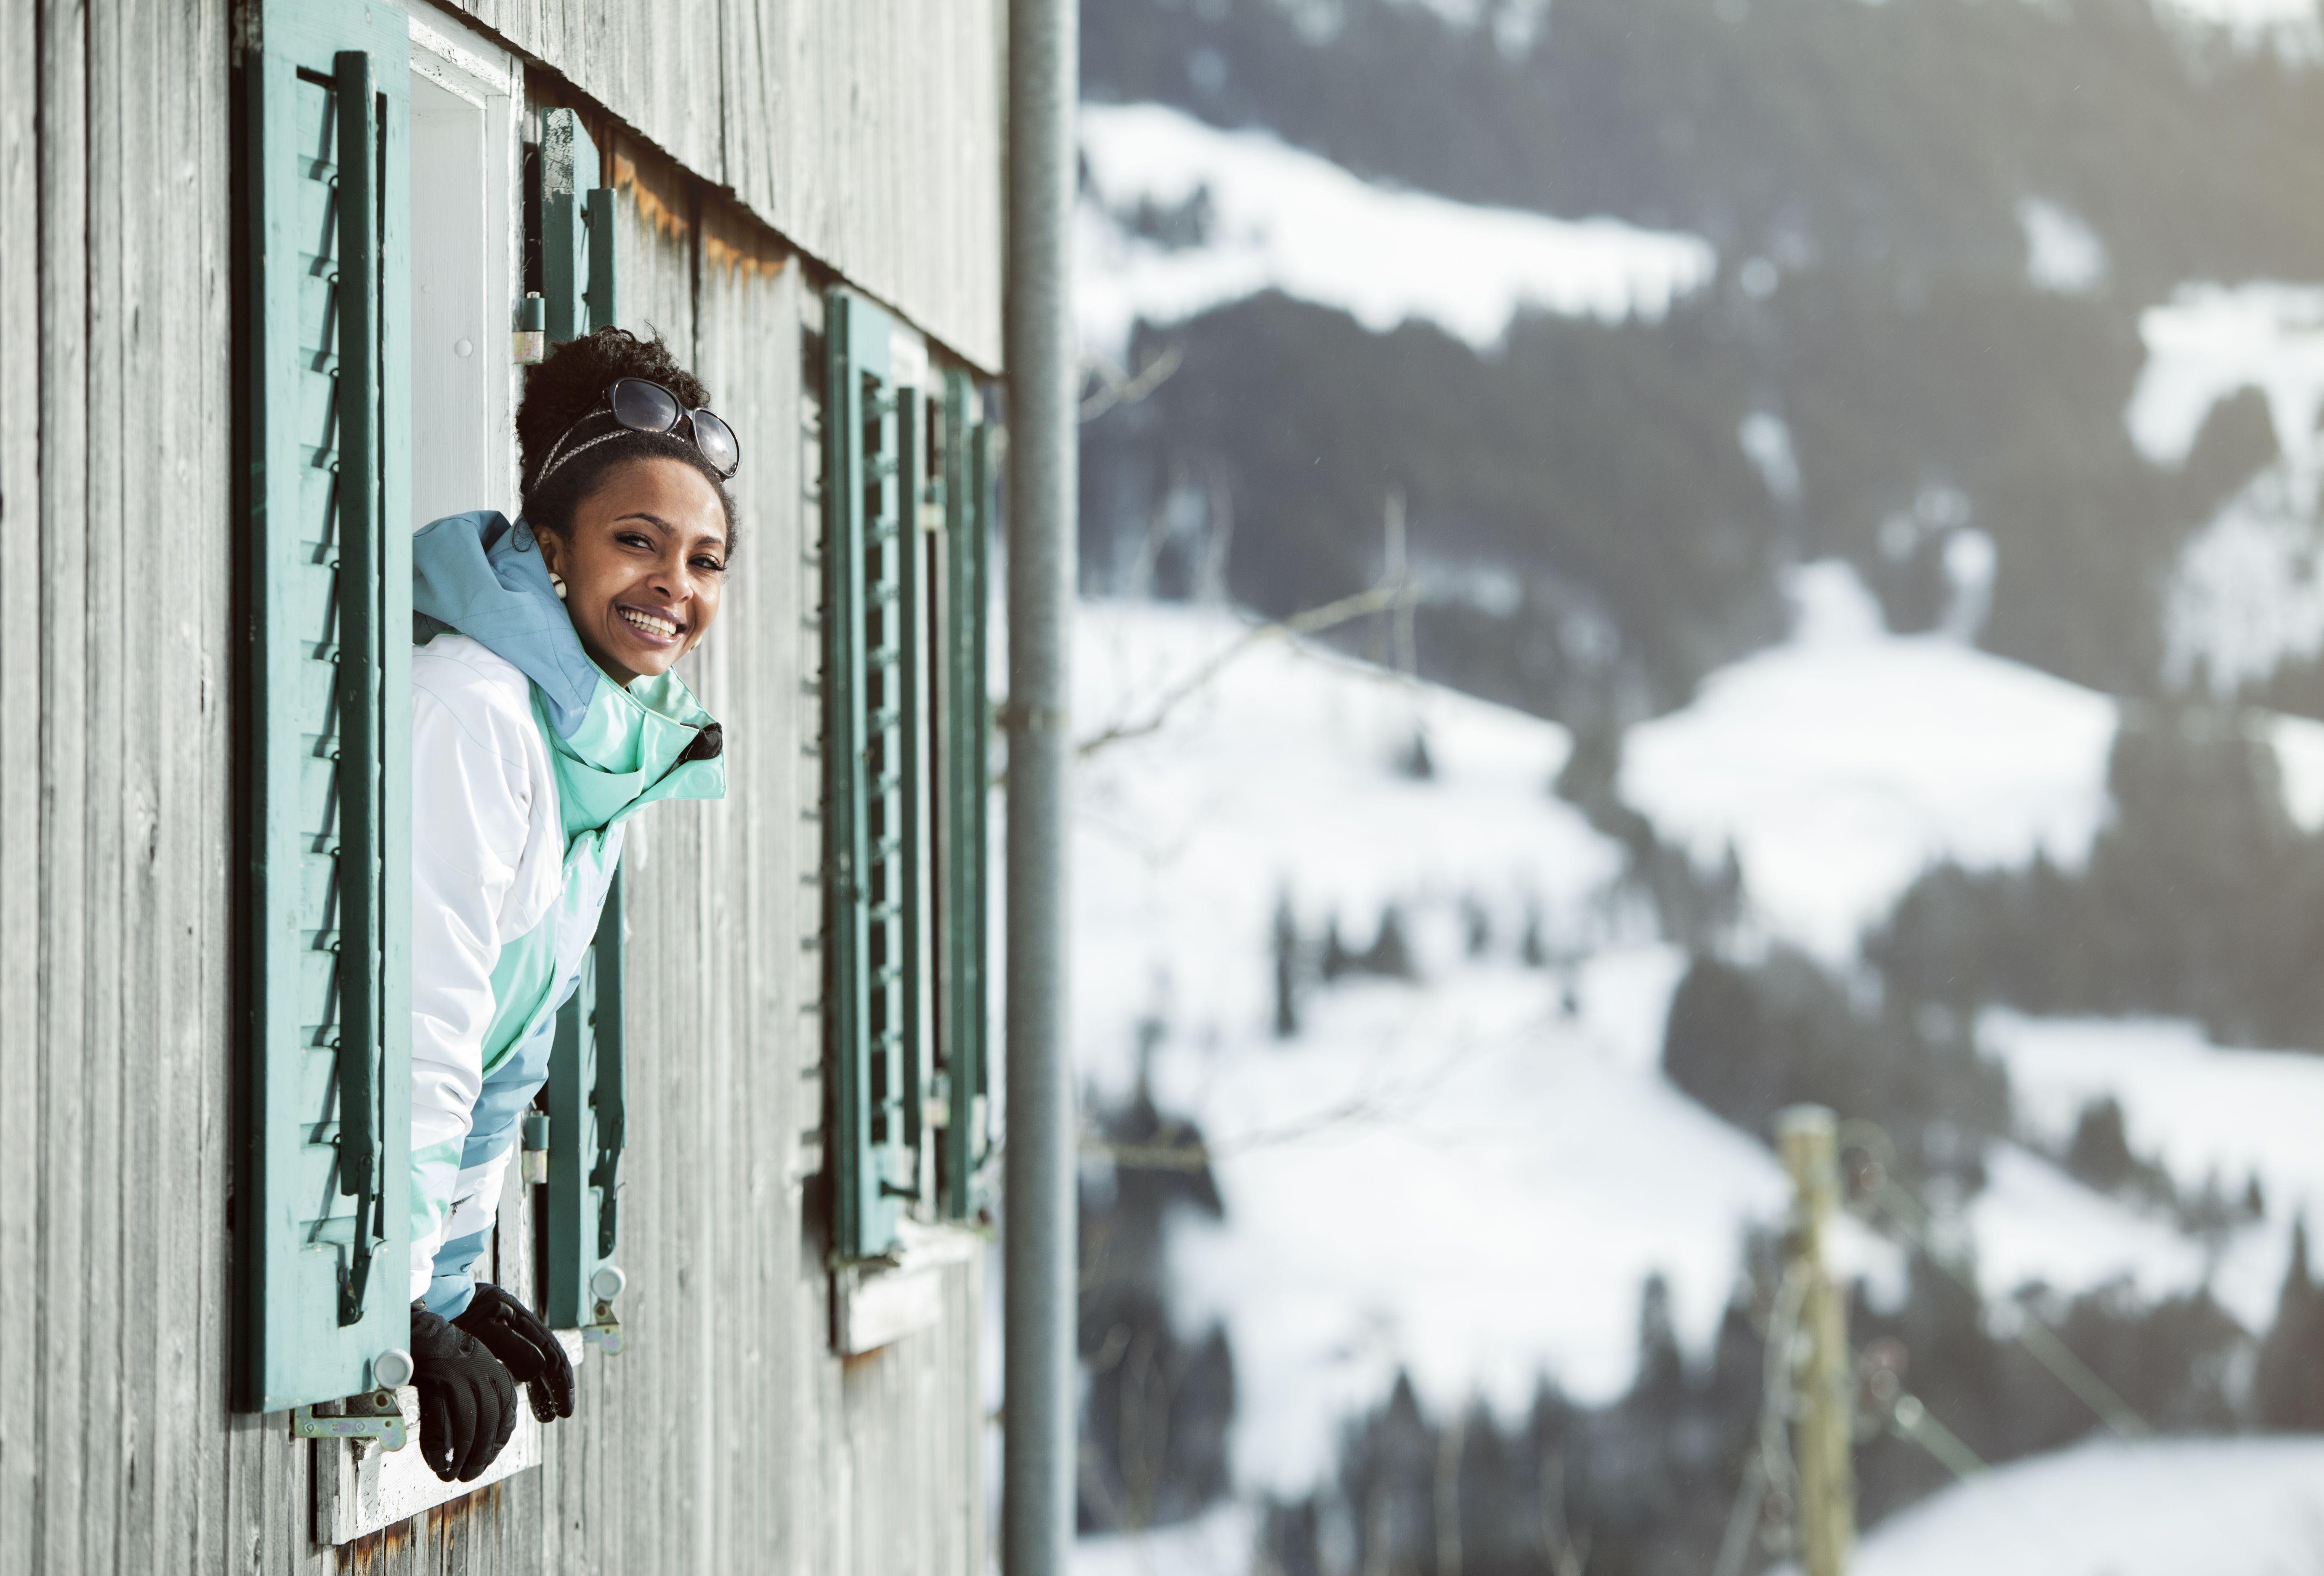 Buy Here Pay Here Okc >> The 6 Best Luxury Ski Wear Companies